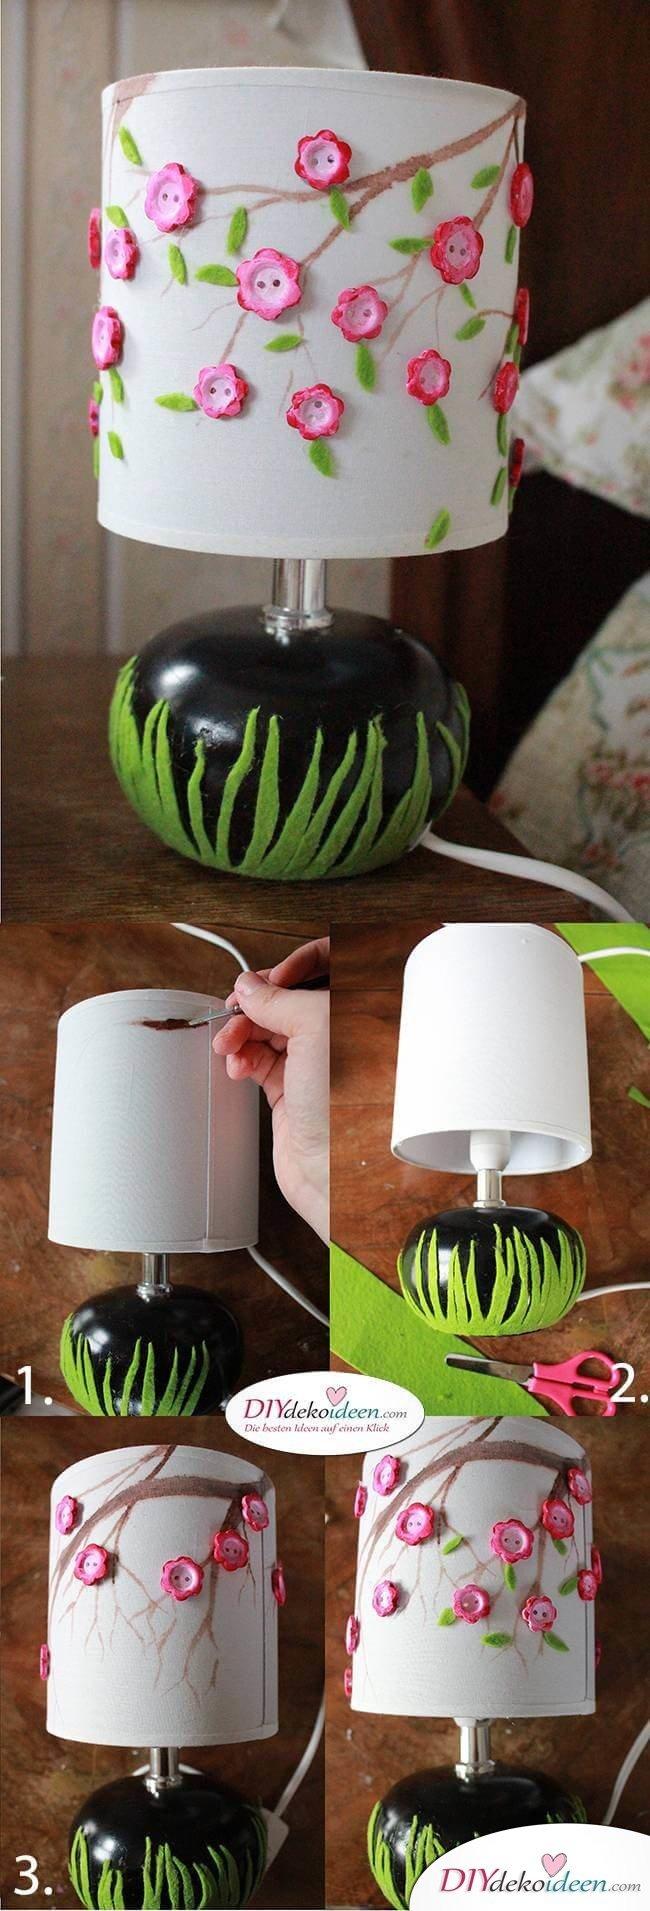 lampe selbst gestalten affordable recycling lampen. Black Bedroom Furniture Sets. Home Design Ideas